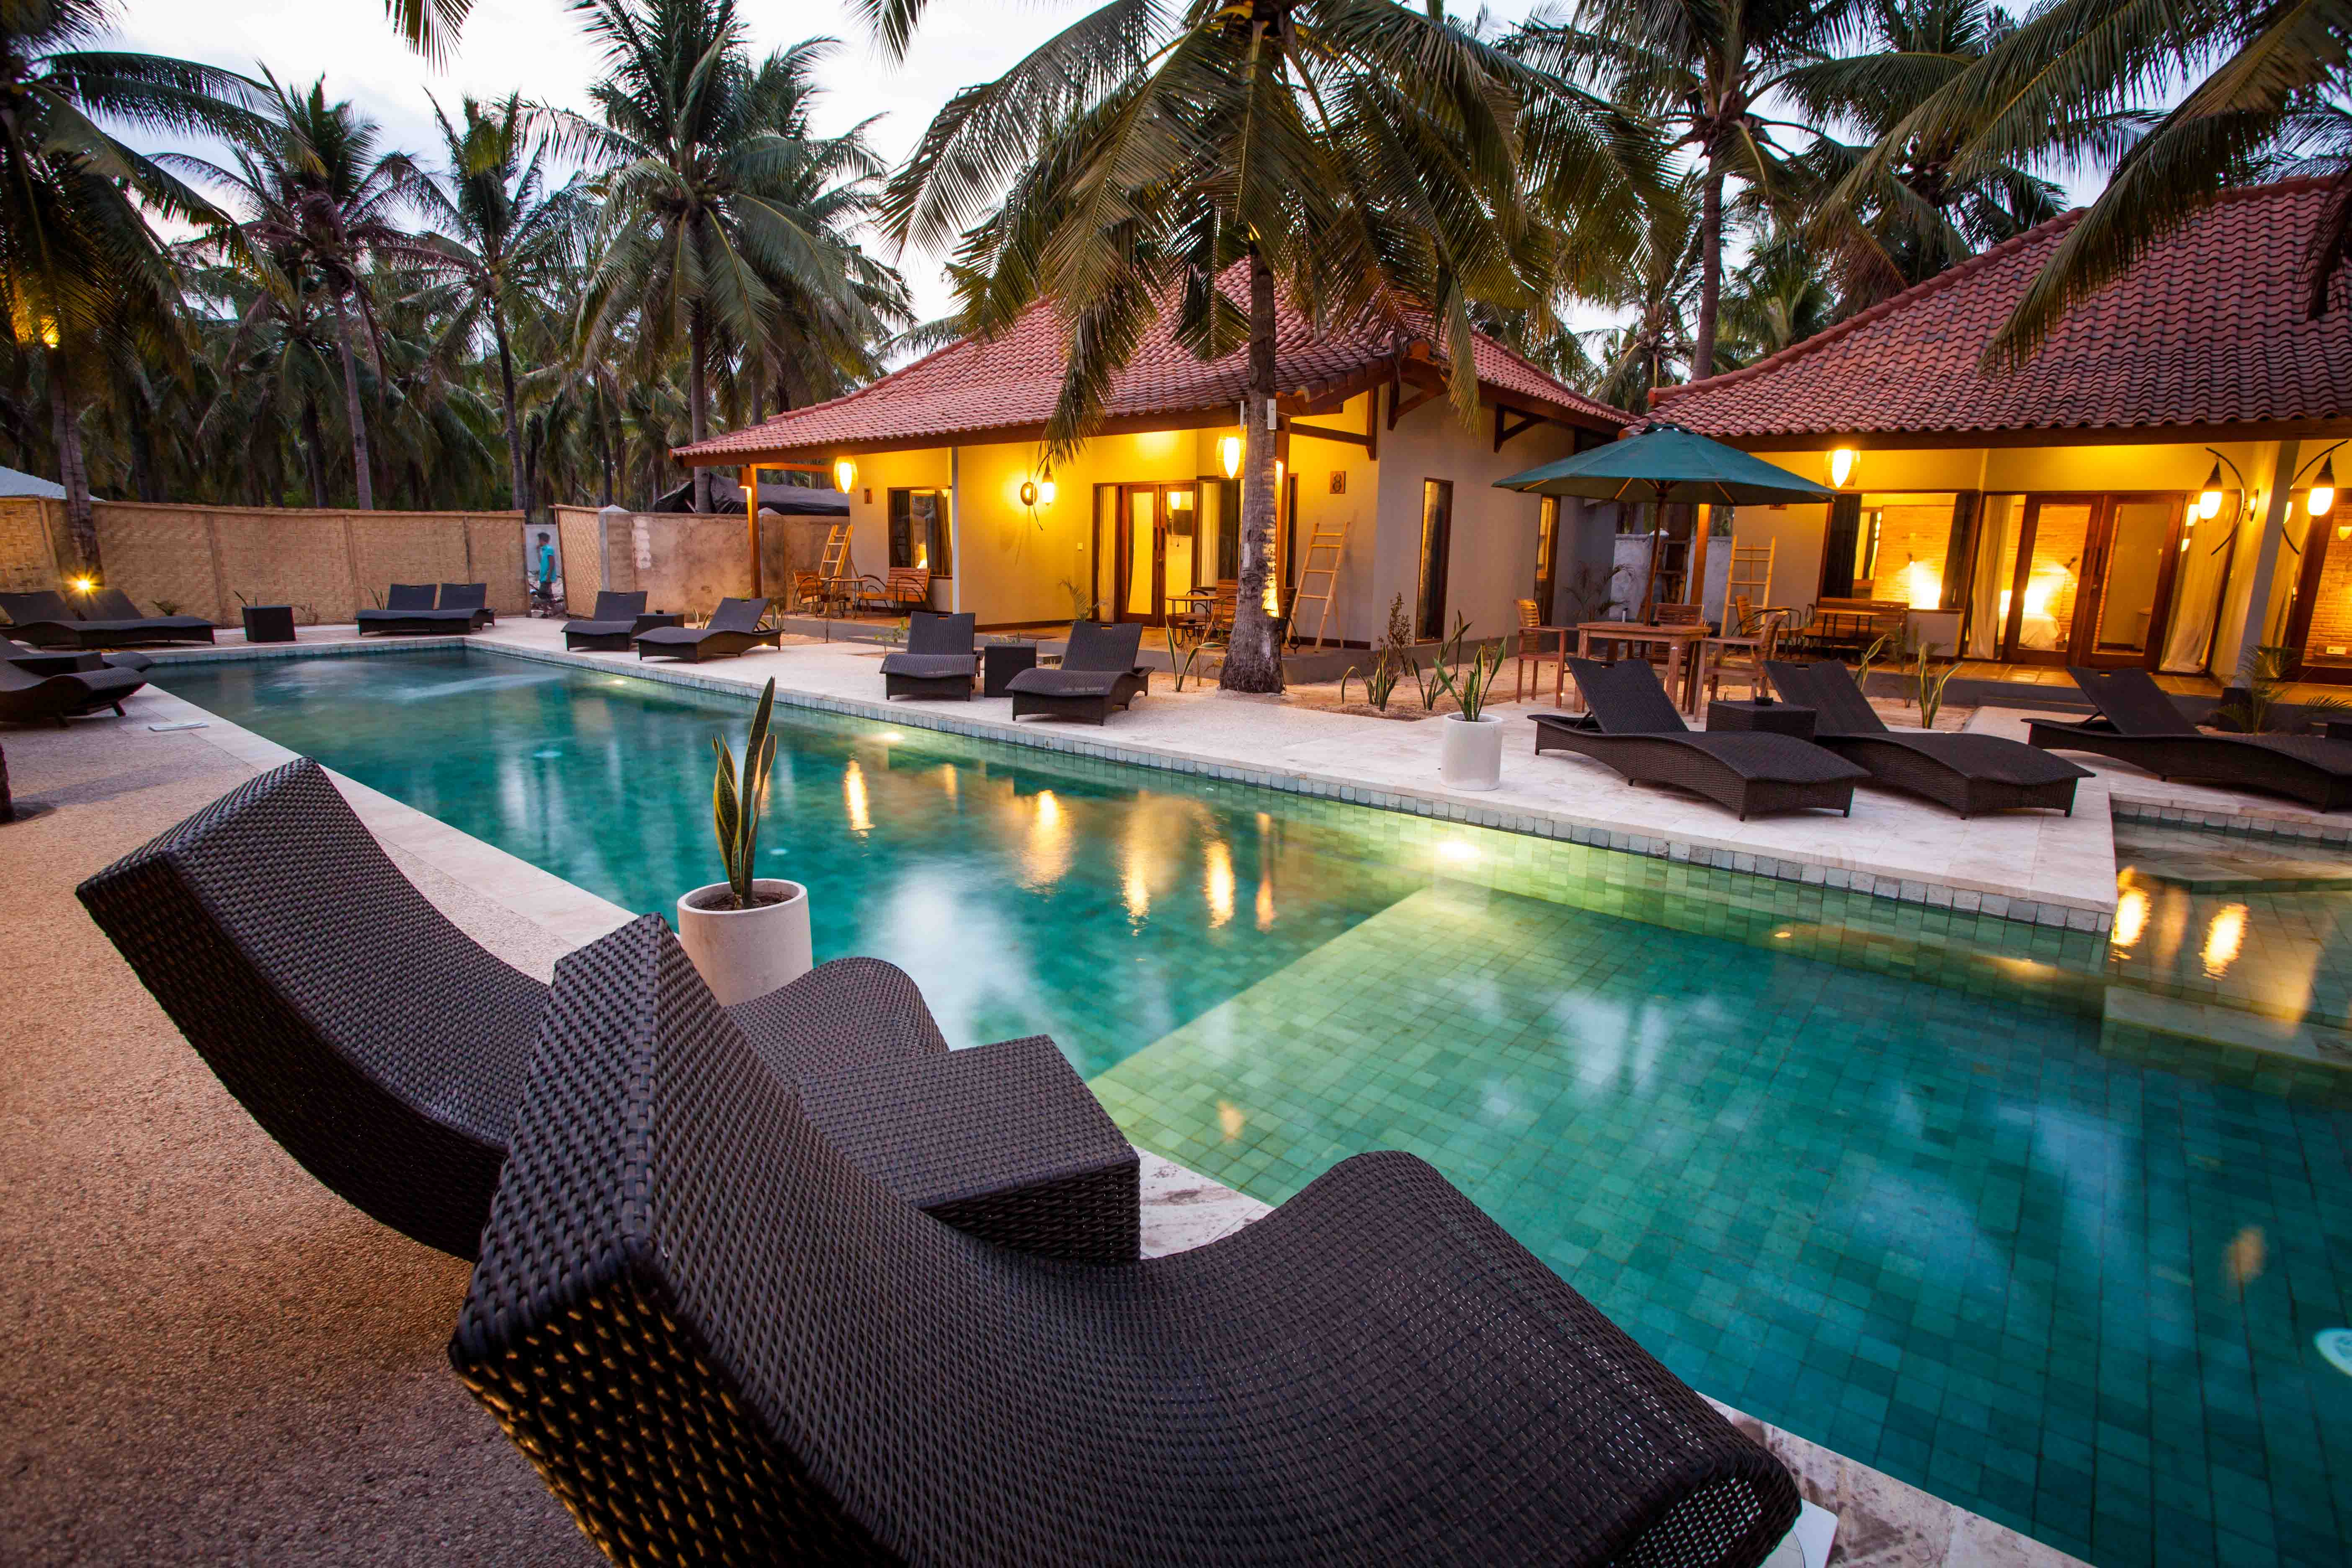 Belukar Belukar A Brand New Hotel Villa Resort Located In The Peaceful Coconut Fields Of Gili